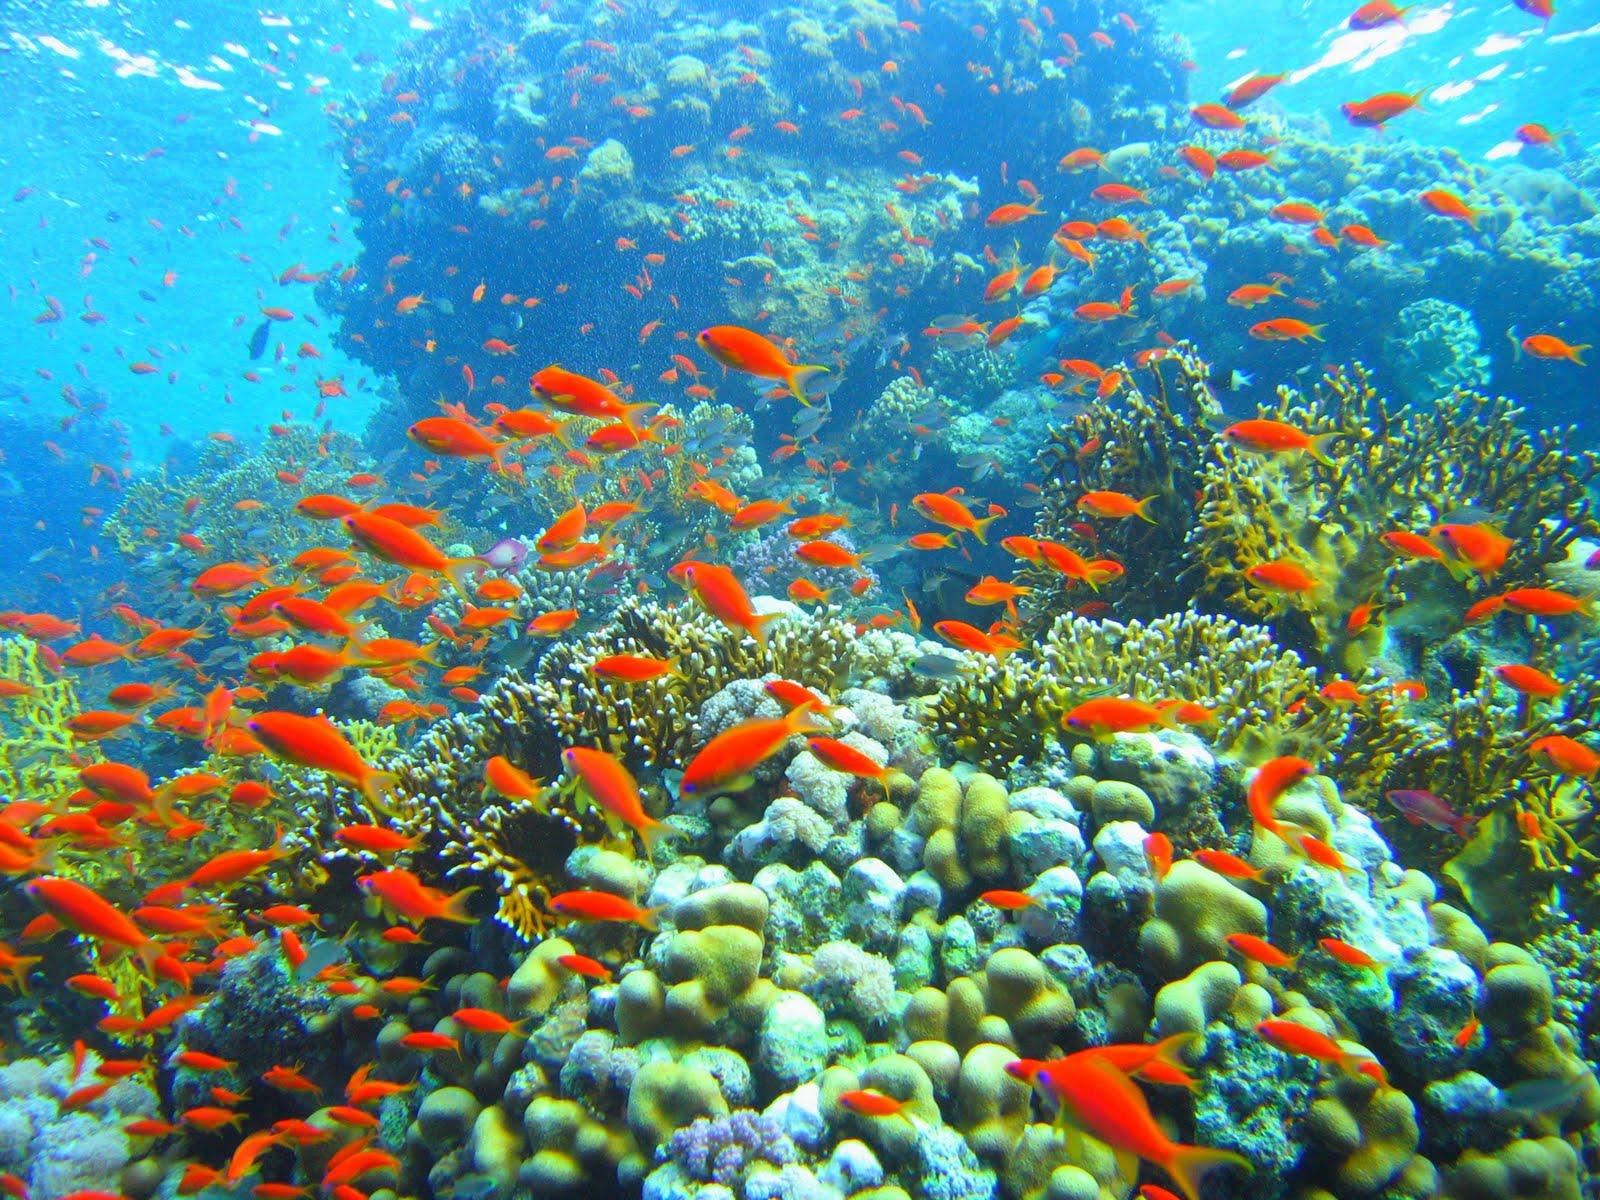 http://4.bp.blogspot.com/-rDw7pM1nP70/Tbk22LvGA2I/AAAAAAAAAG0/uPSfxeK-PUA/s1600/Coral_reef_in_Ras_Muhammad_nature_park_%2528Iolanda_reef%2529.jpg